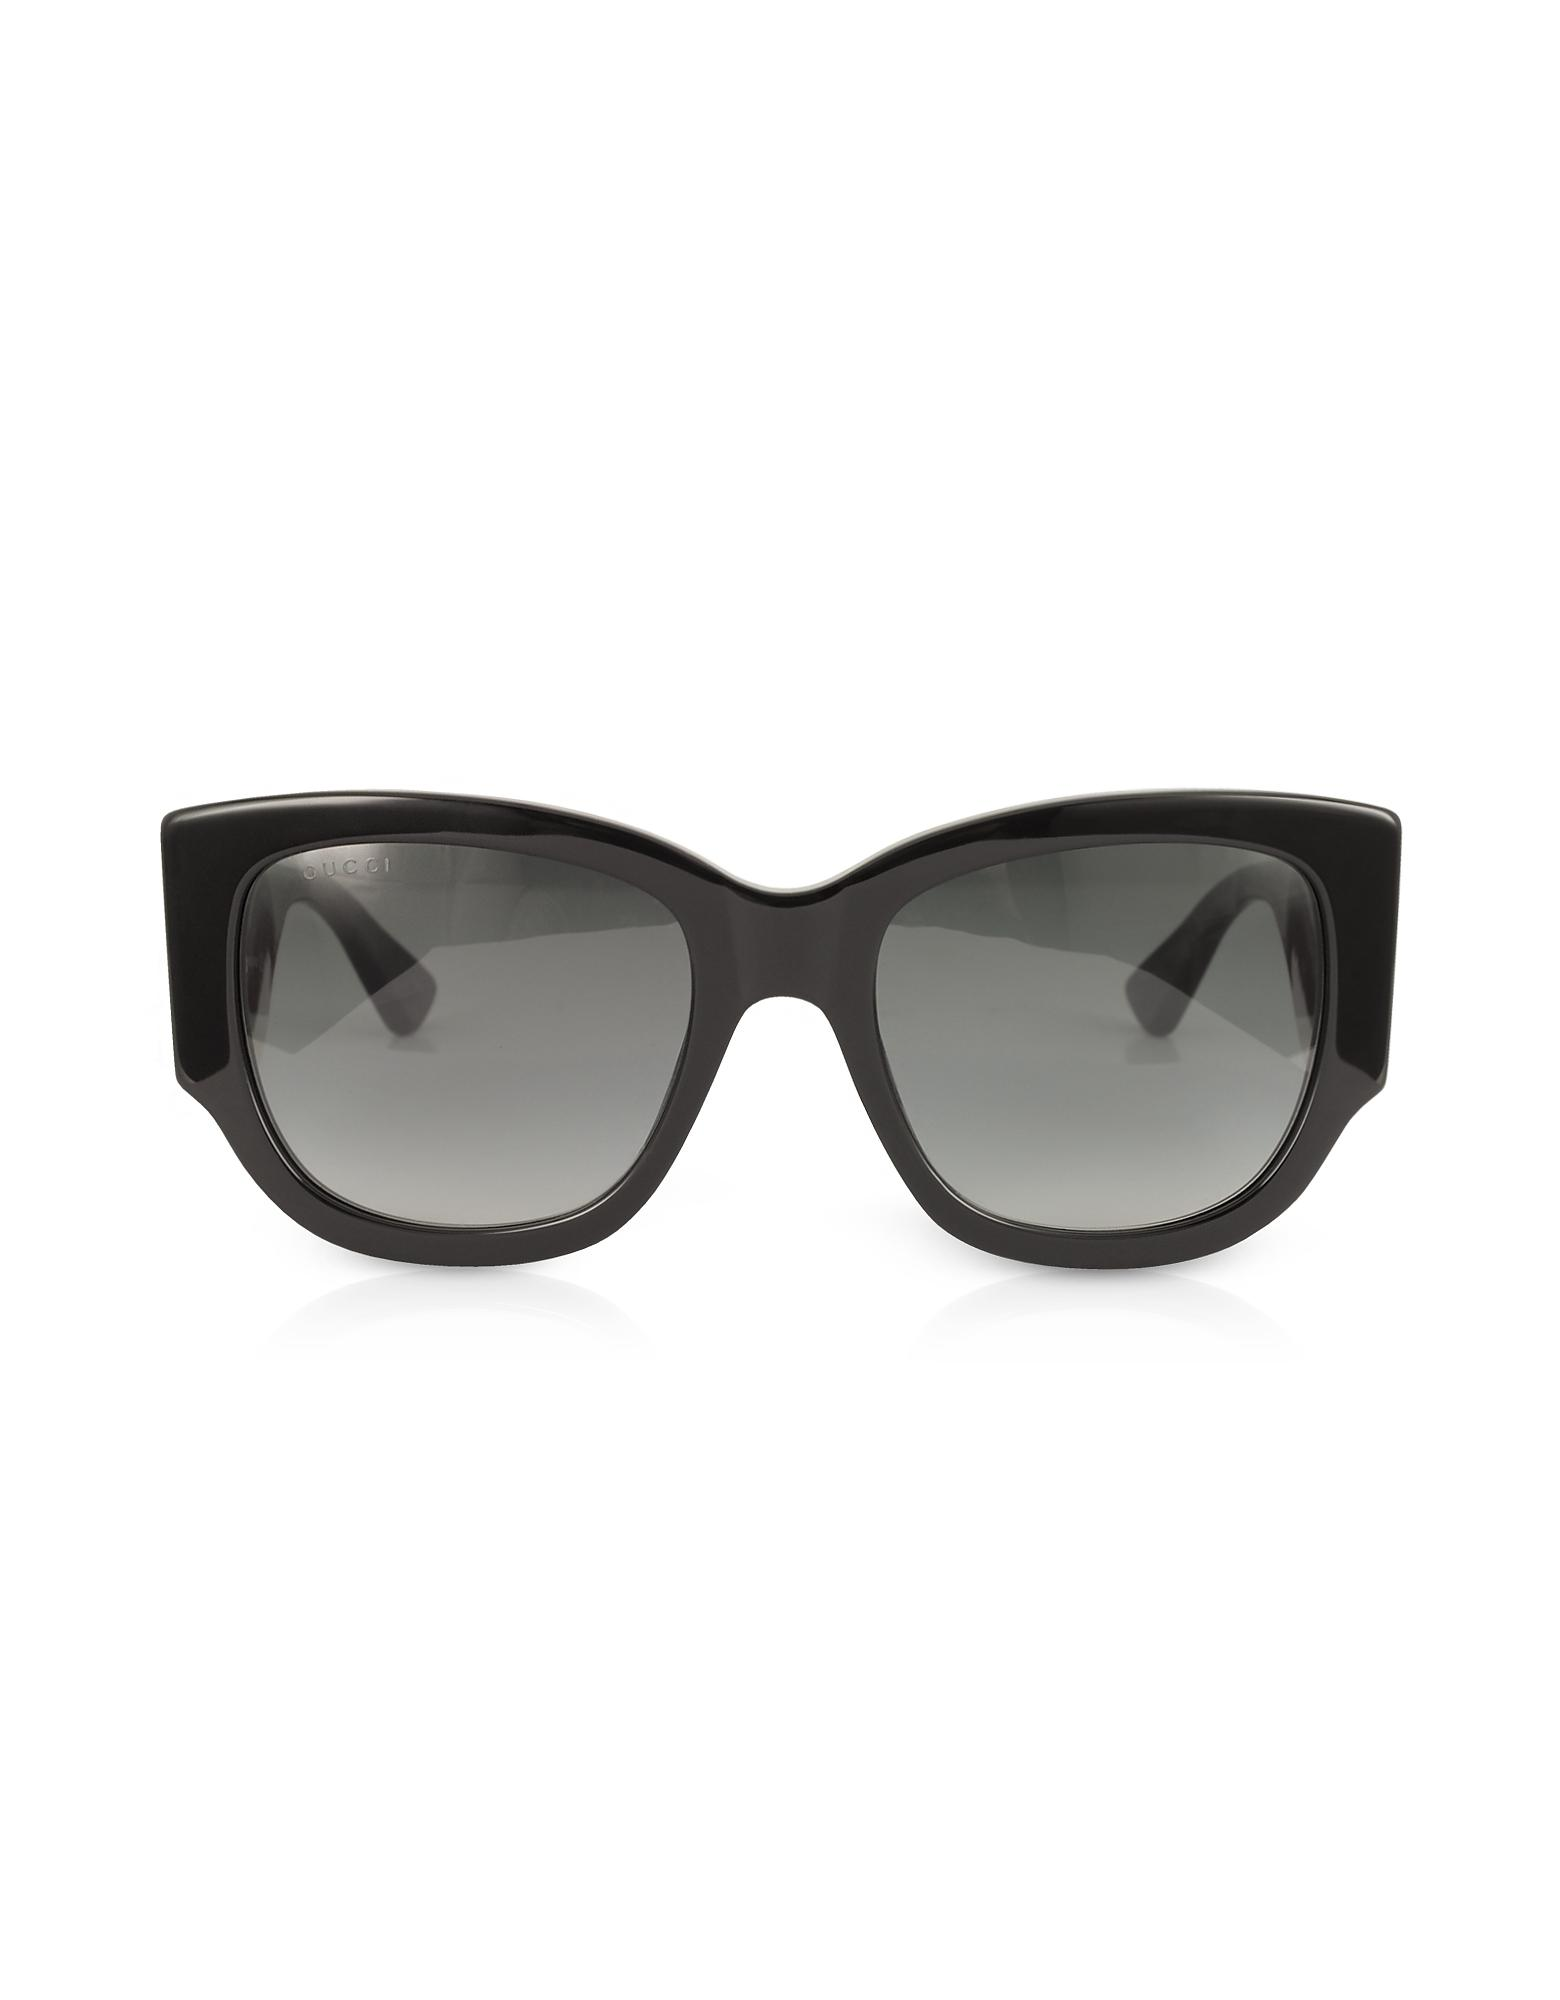 5d7ad9a198004 Gucci - GG0276S Black Oversize Cat Eye Acetate Sunglasses W sylvie Web  Temples - Lyst. View fullscreen